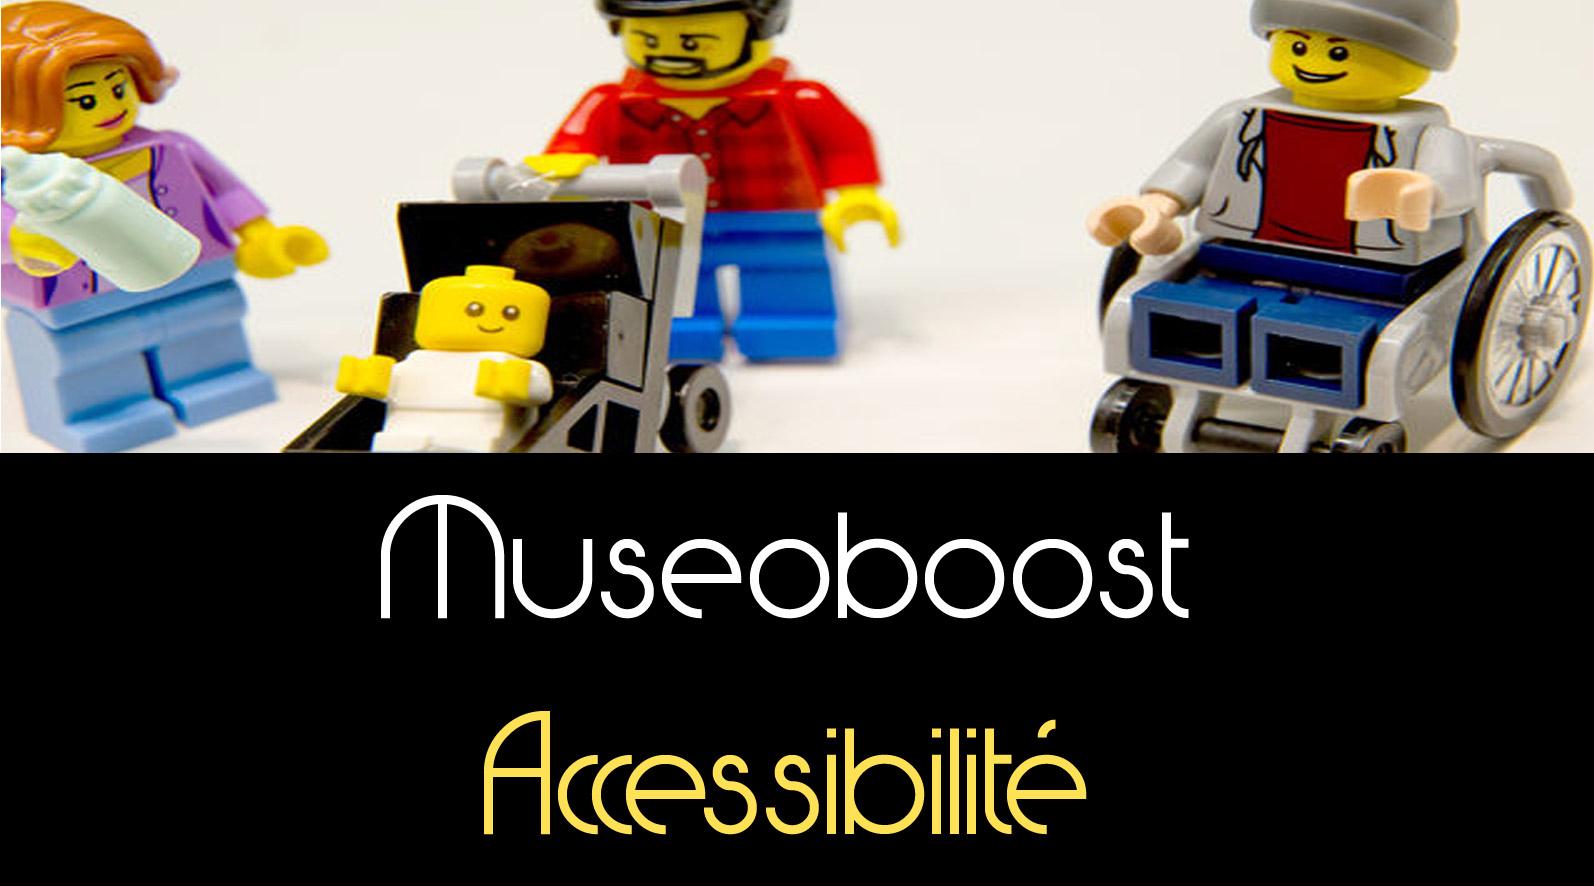 Museoboost accessibilité